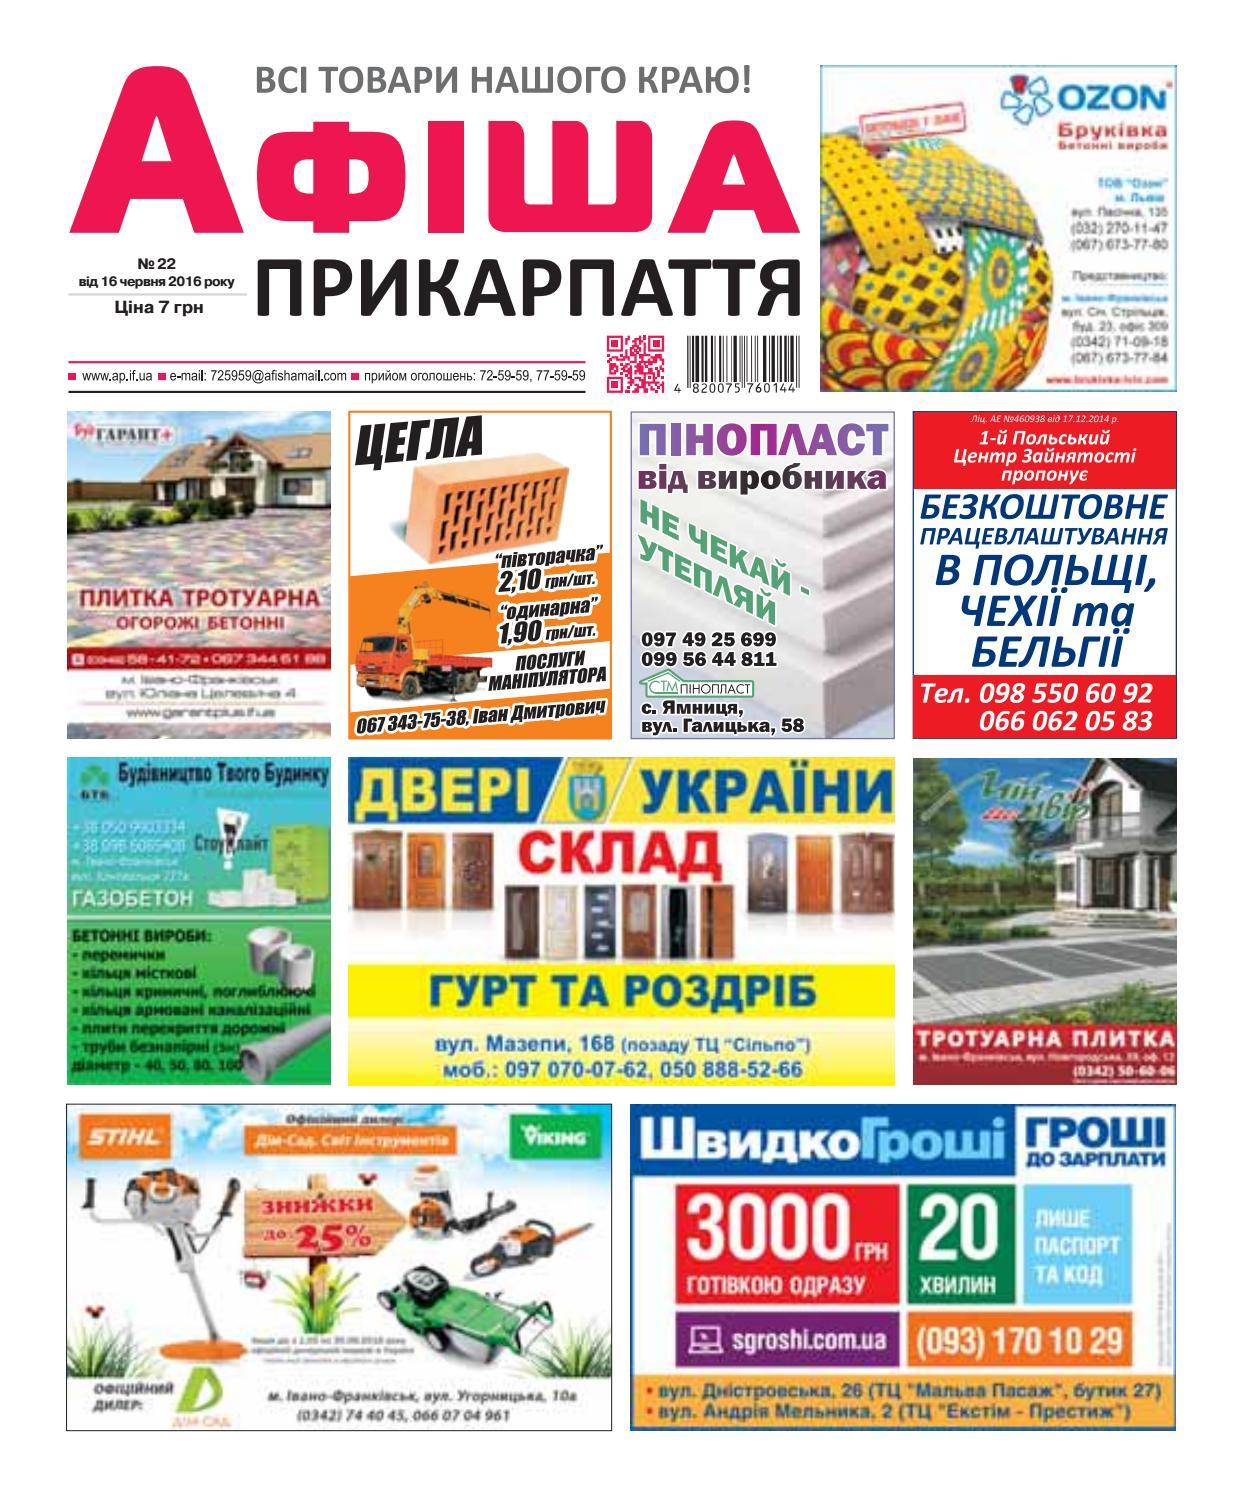 Афіша ПРИКАРПАТТЯ №22 by Olya Olya - issuu f5d6d0a240ab1